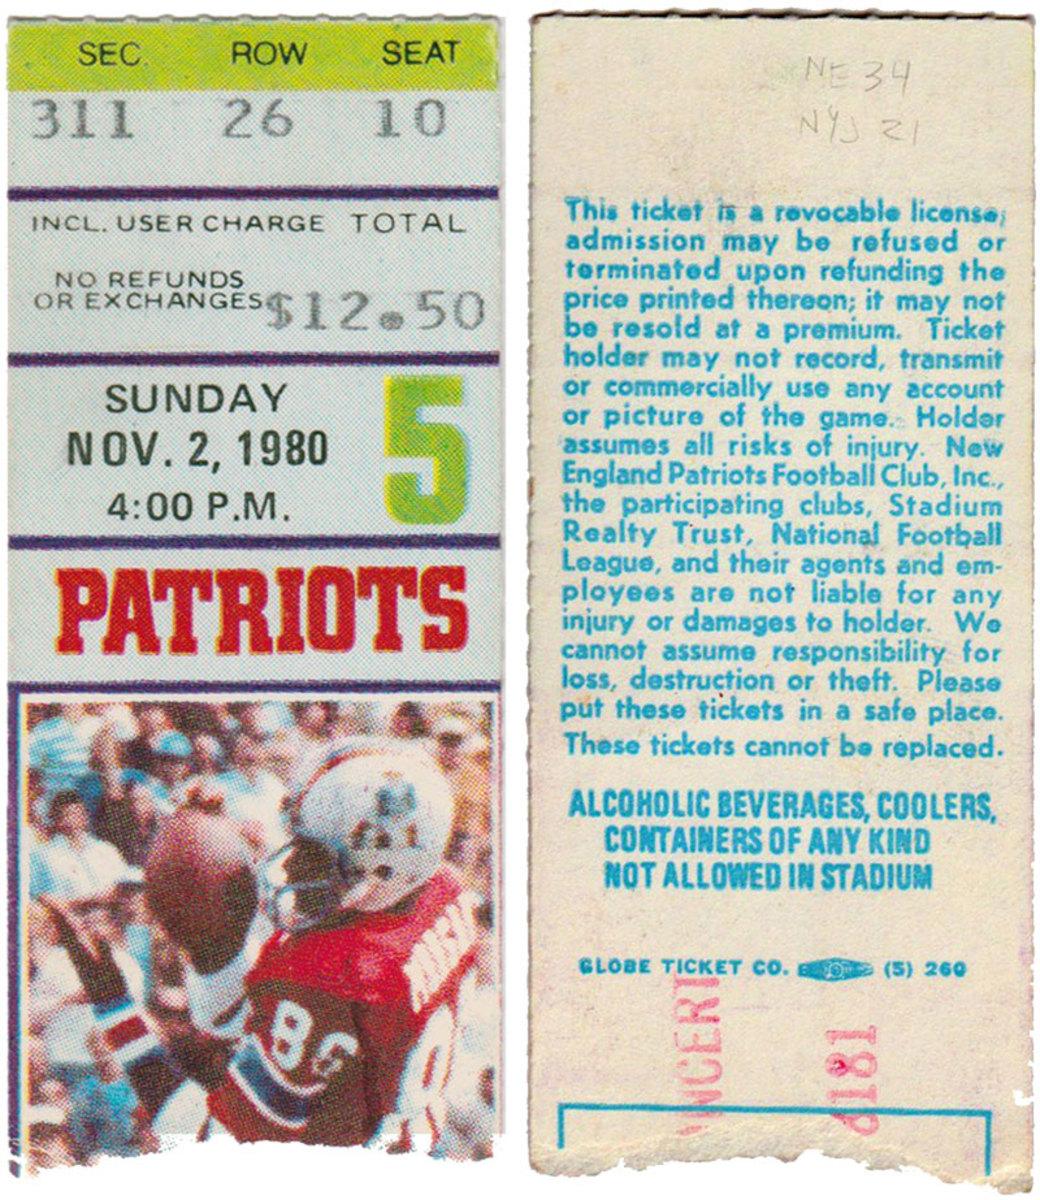 patriots-tickets-together.jpg